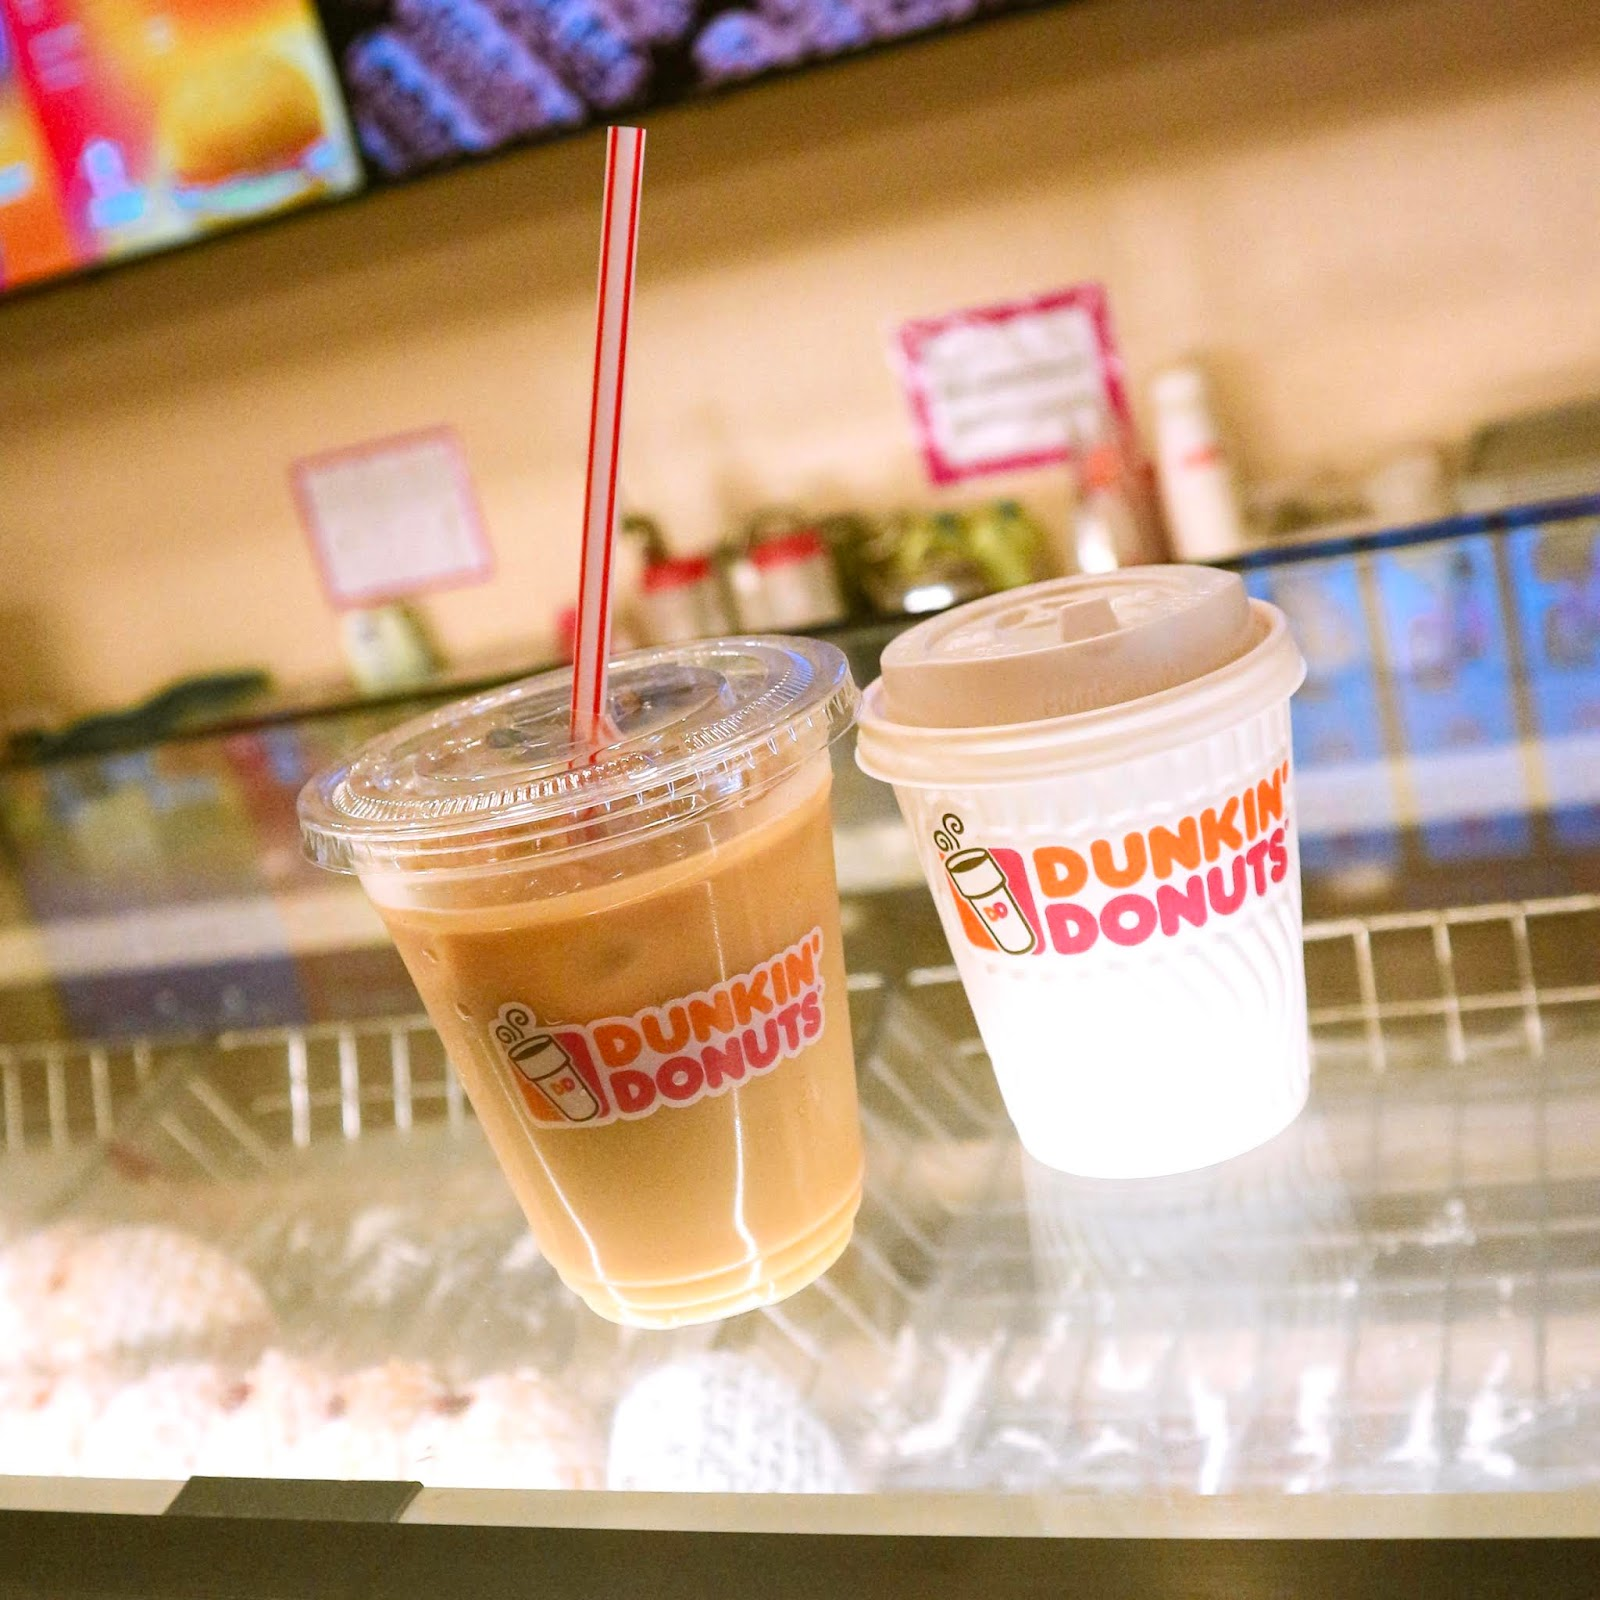 Dunkin' Donuts Half Half Hooray Promo